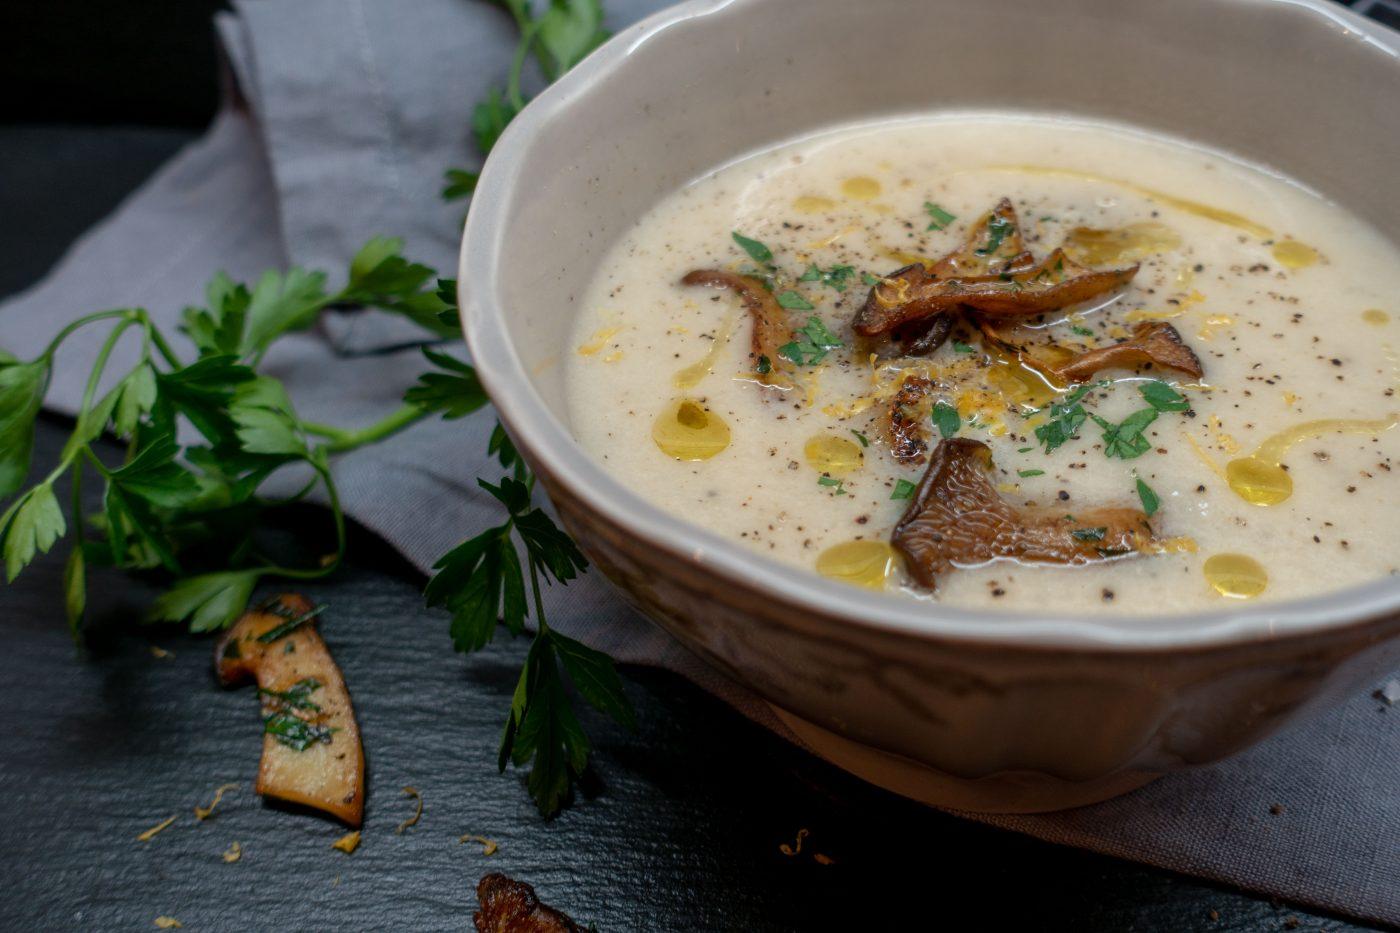 Schwarzwurzel-Suppe mit Kräuterseitlingen